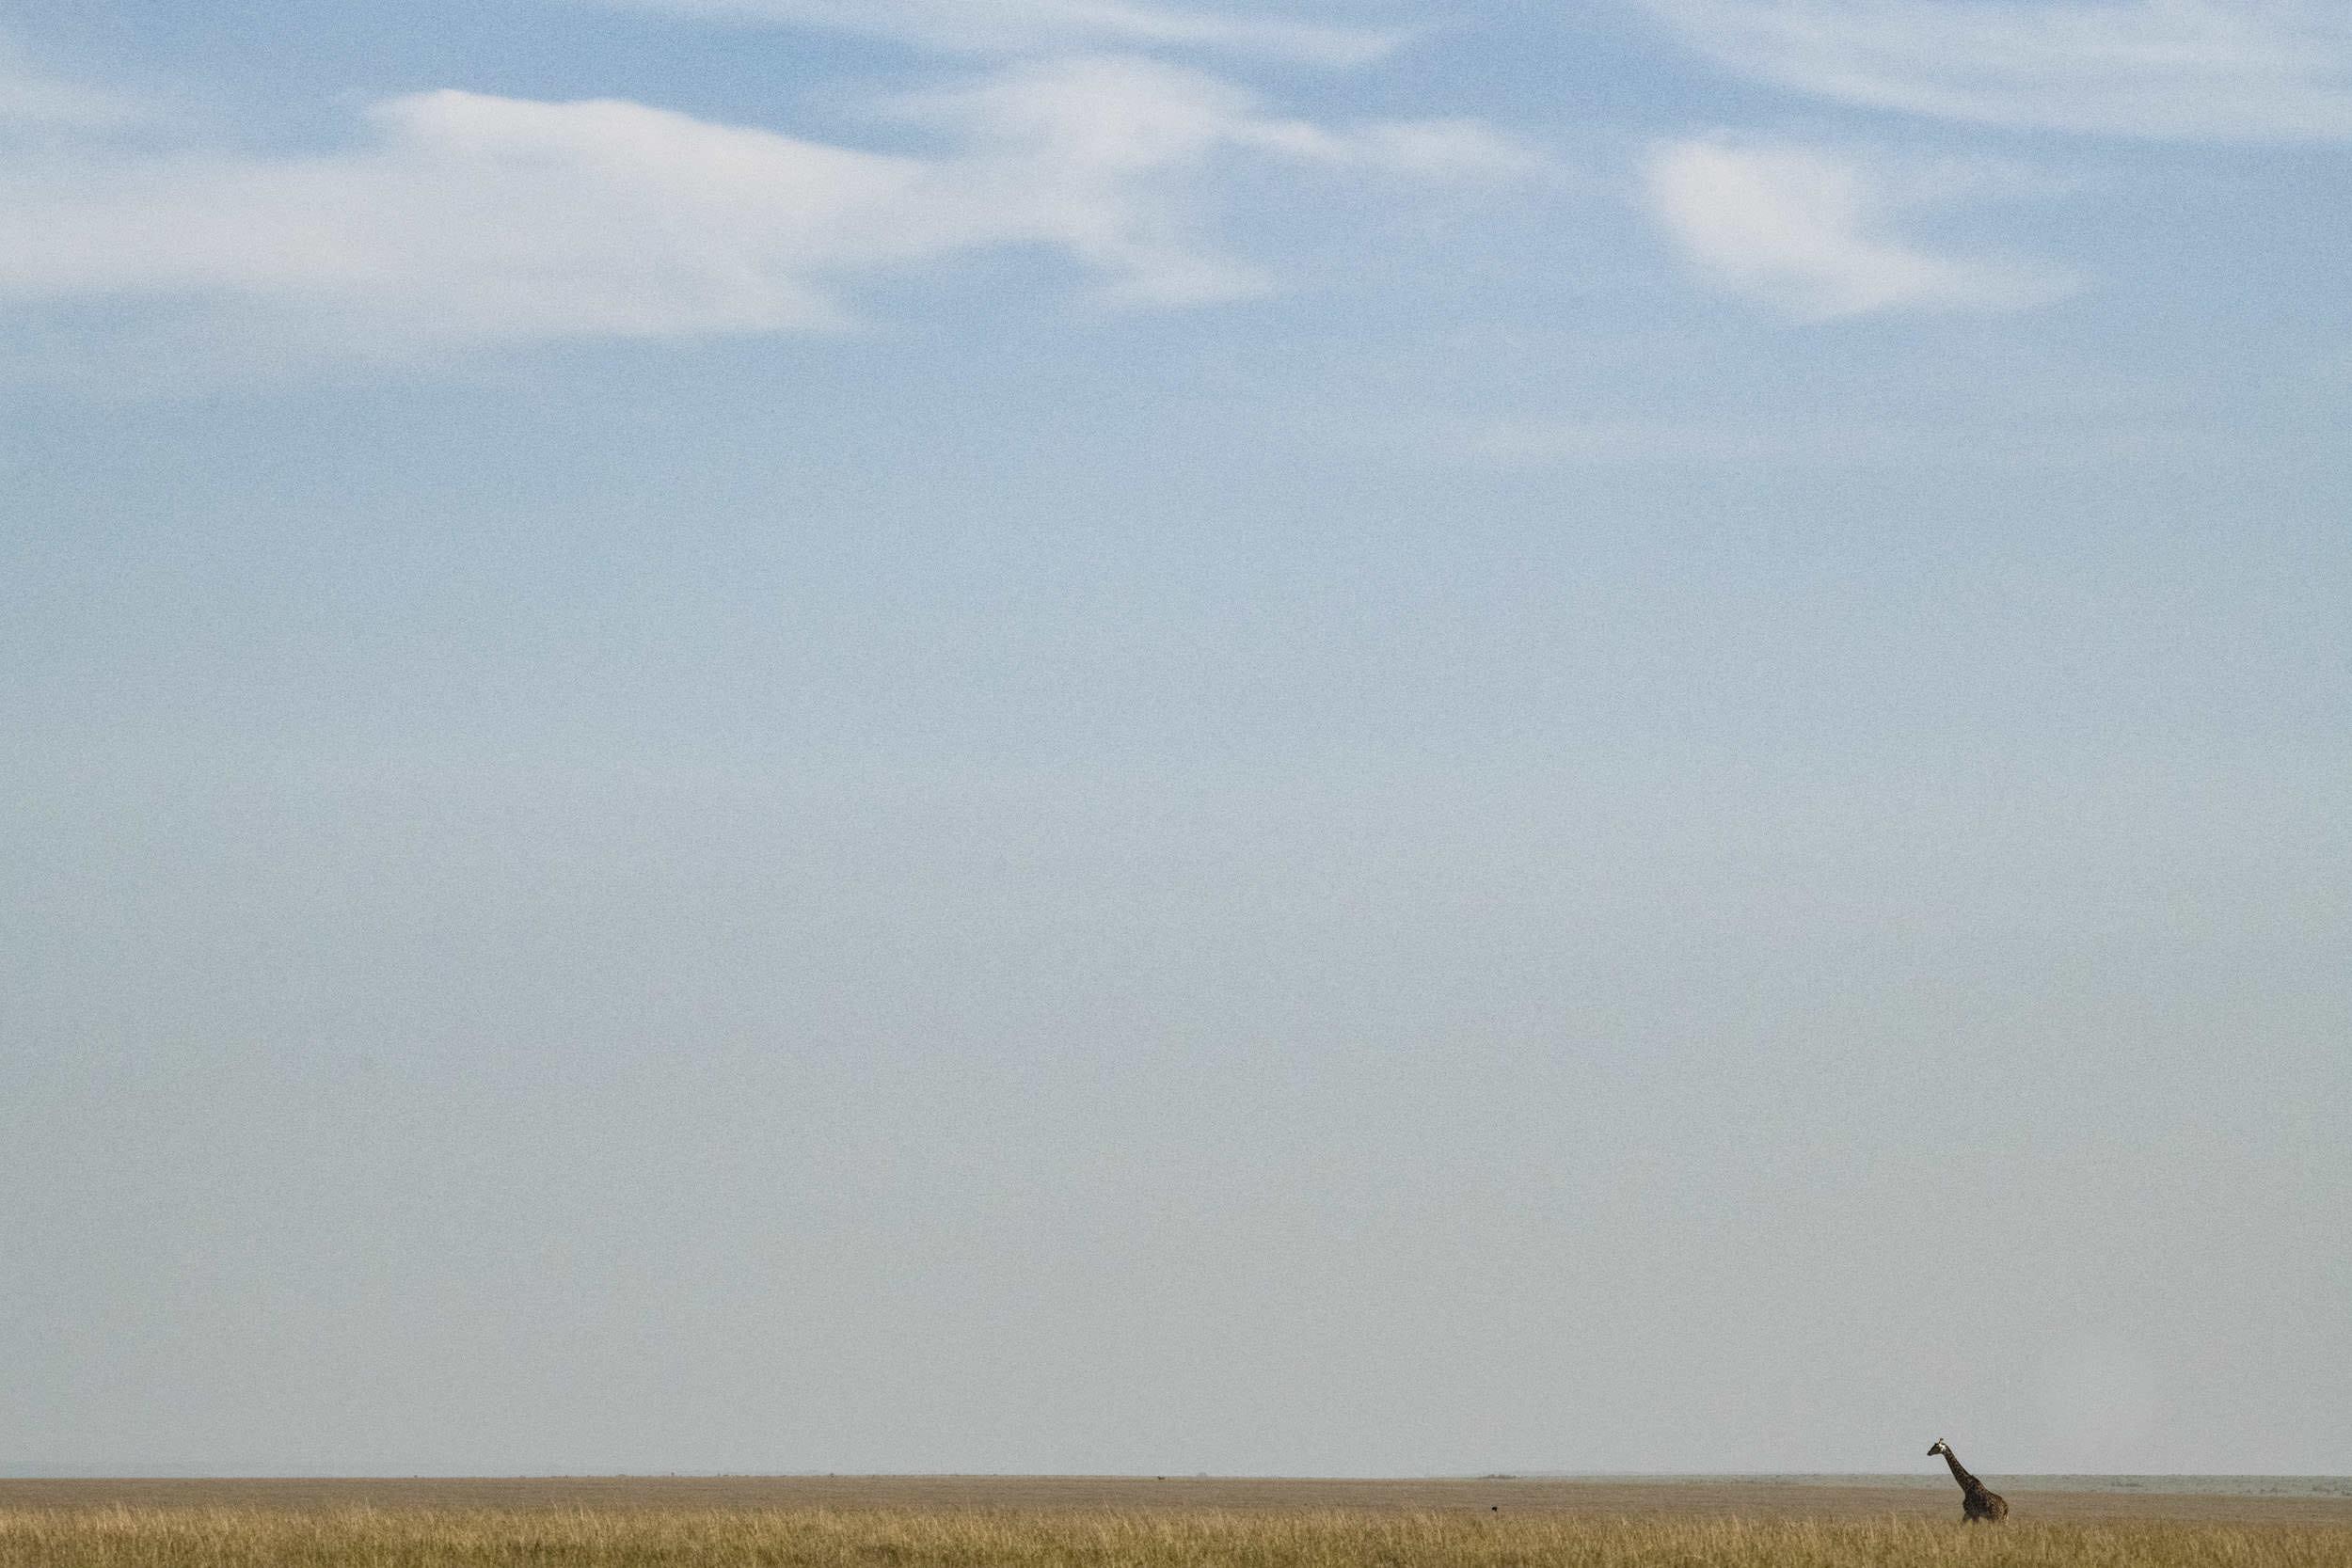 Single giraffe on African savannah landscape.jpg